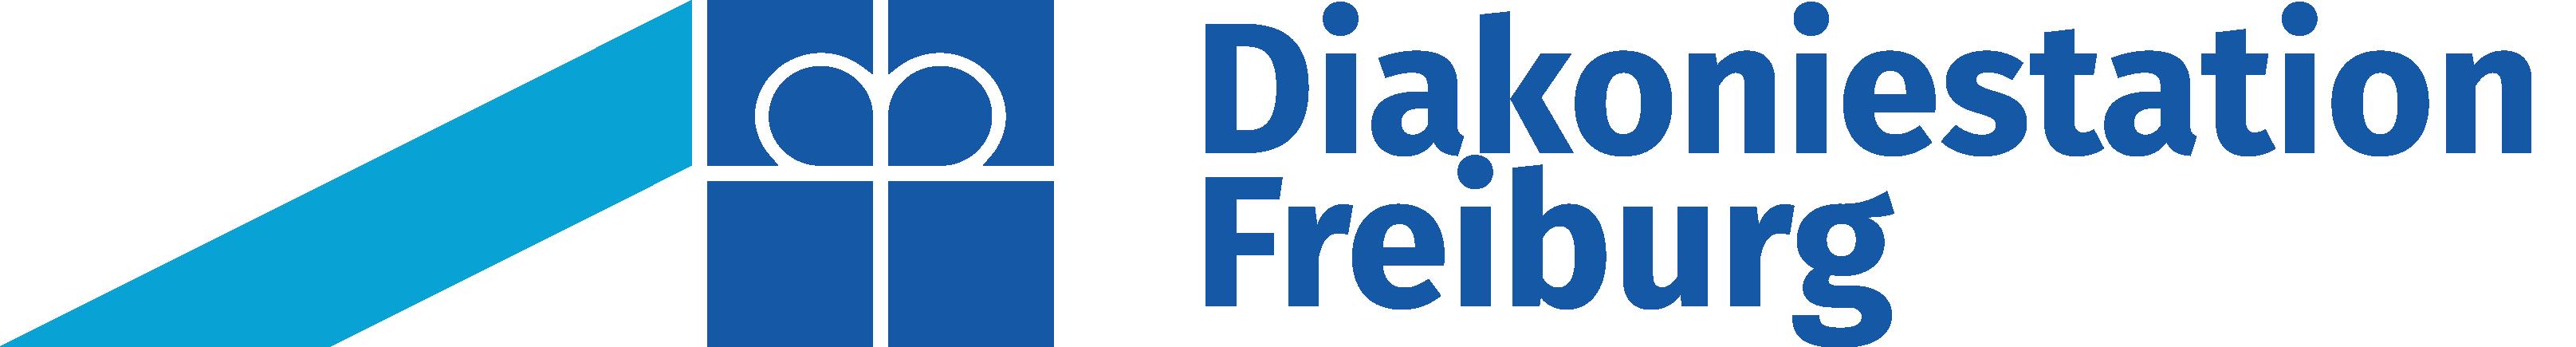 Diakoniestation Freiburg